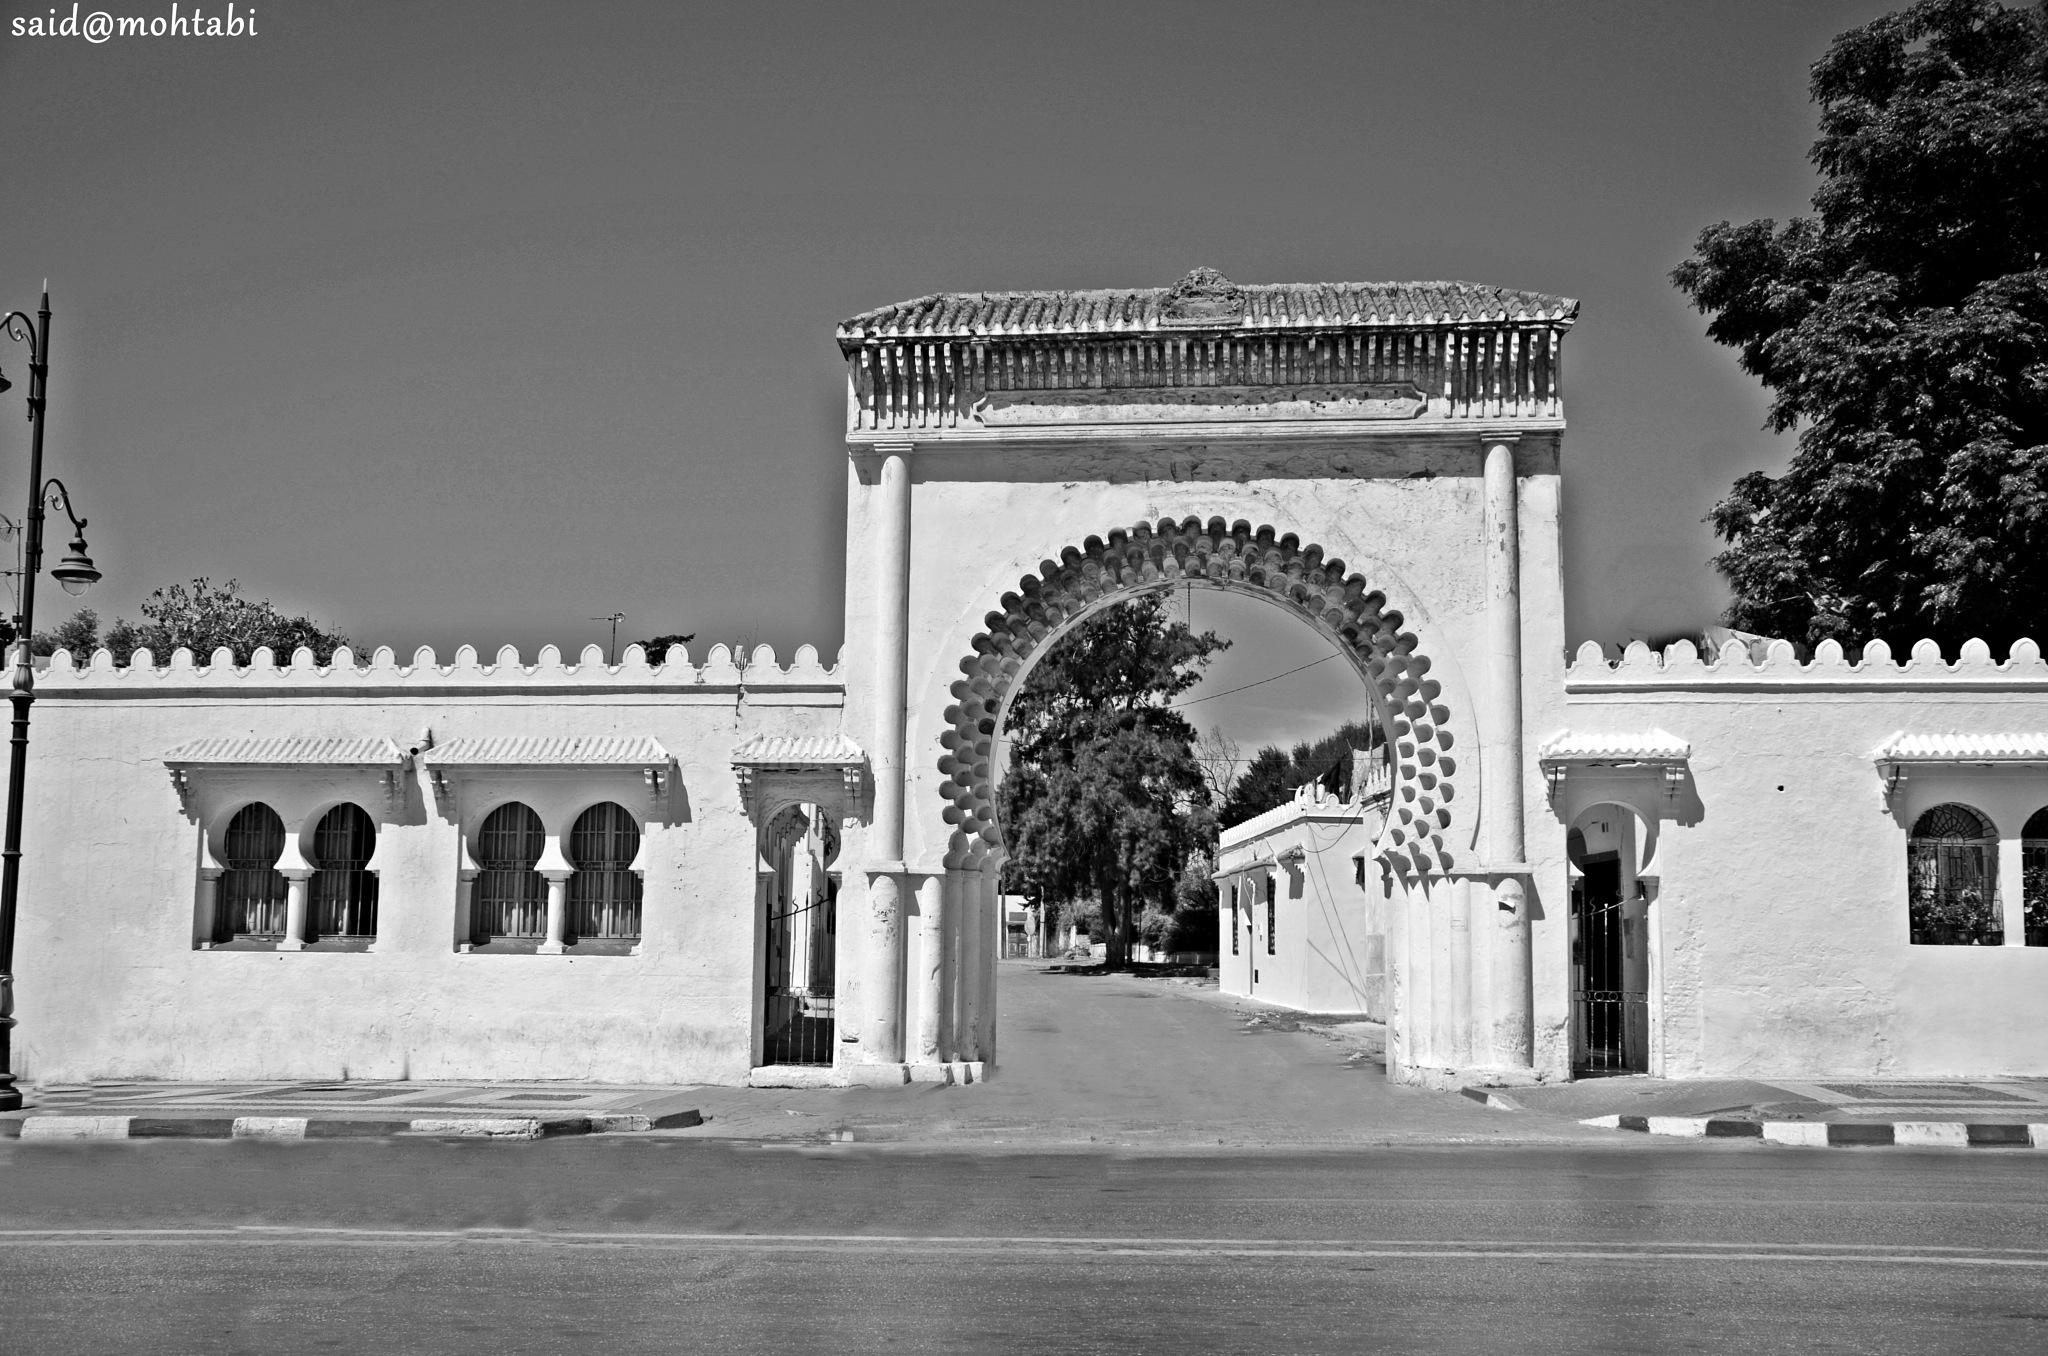 L'arayech city morocco by Said Mohtabi